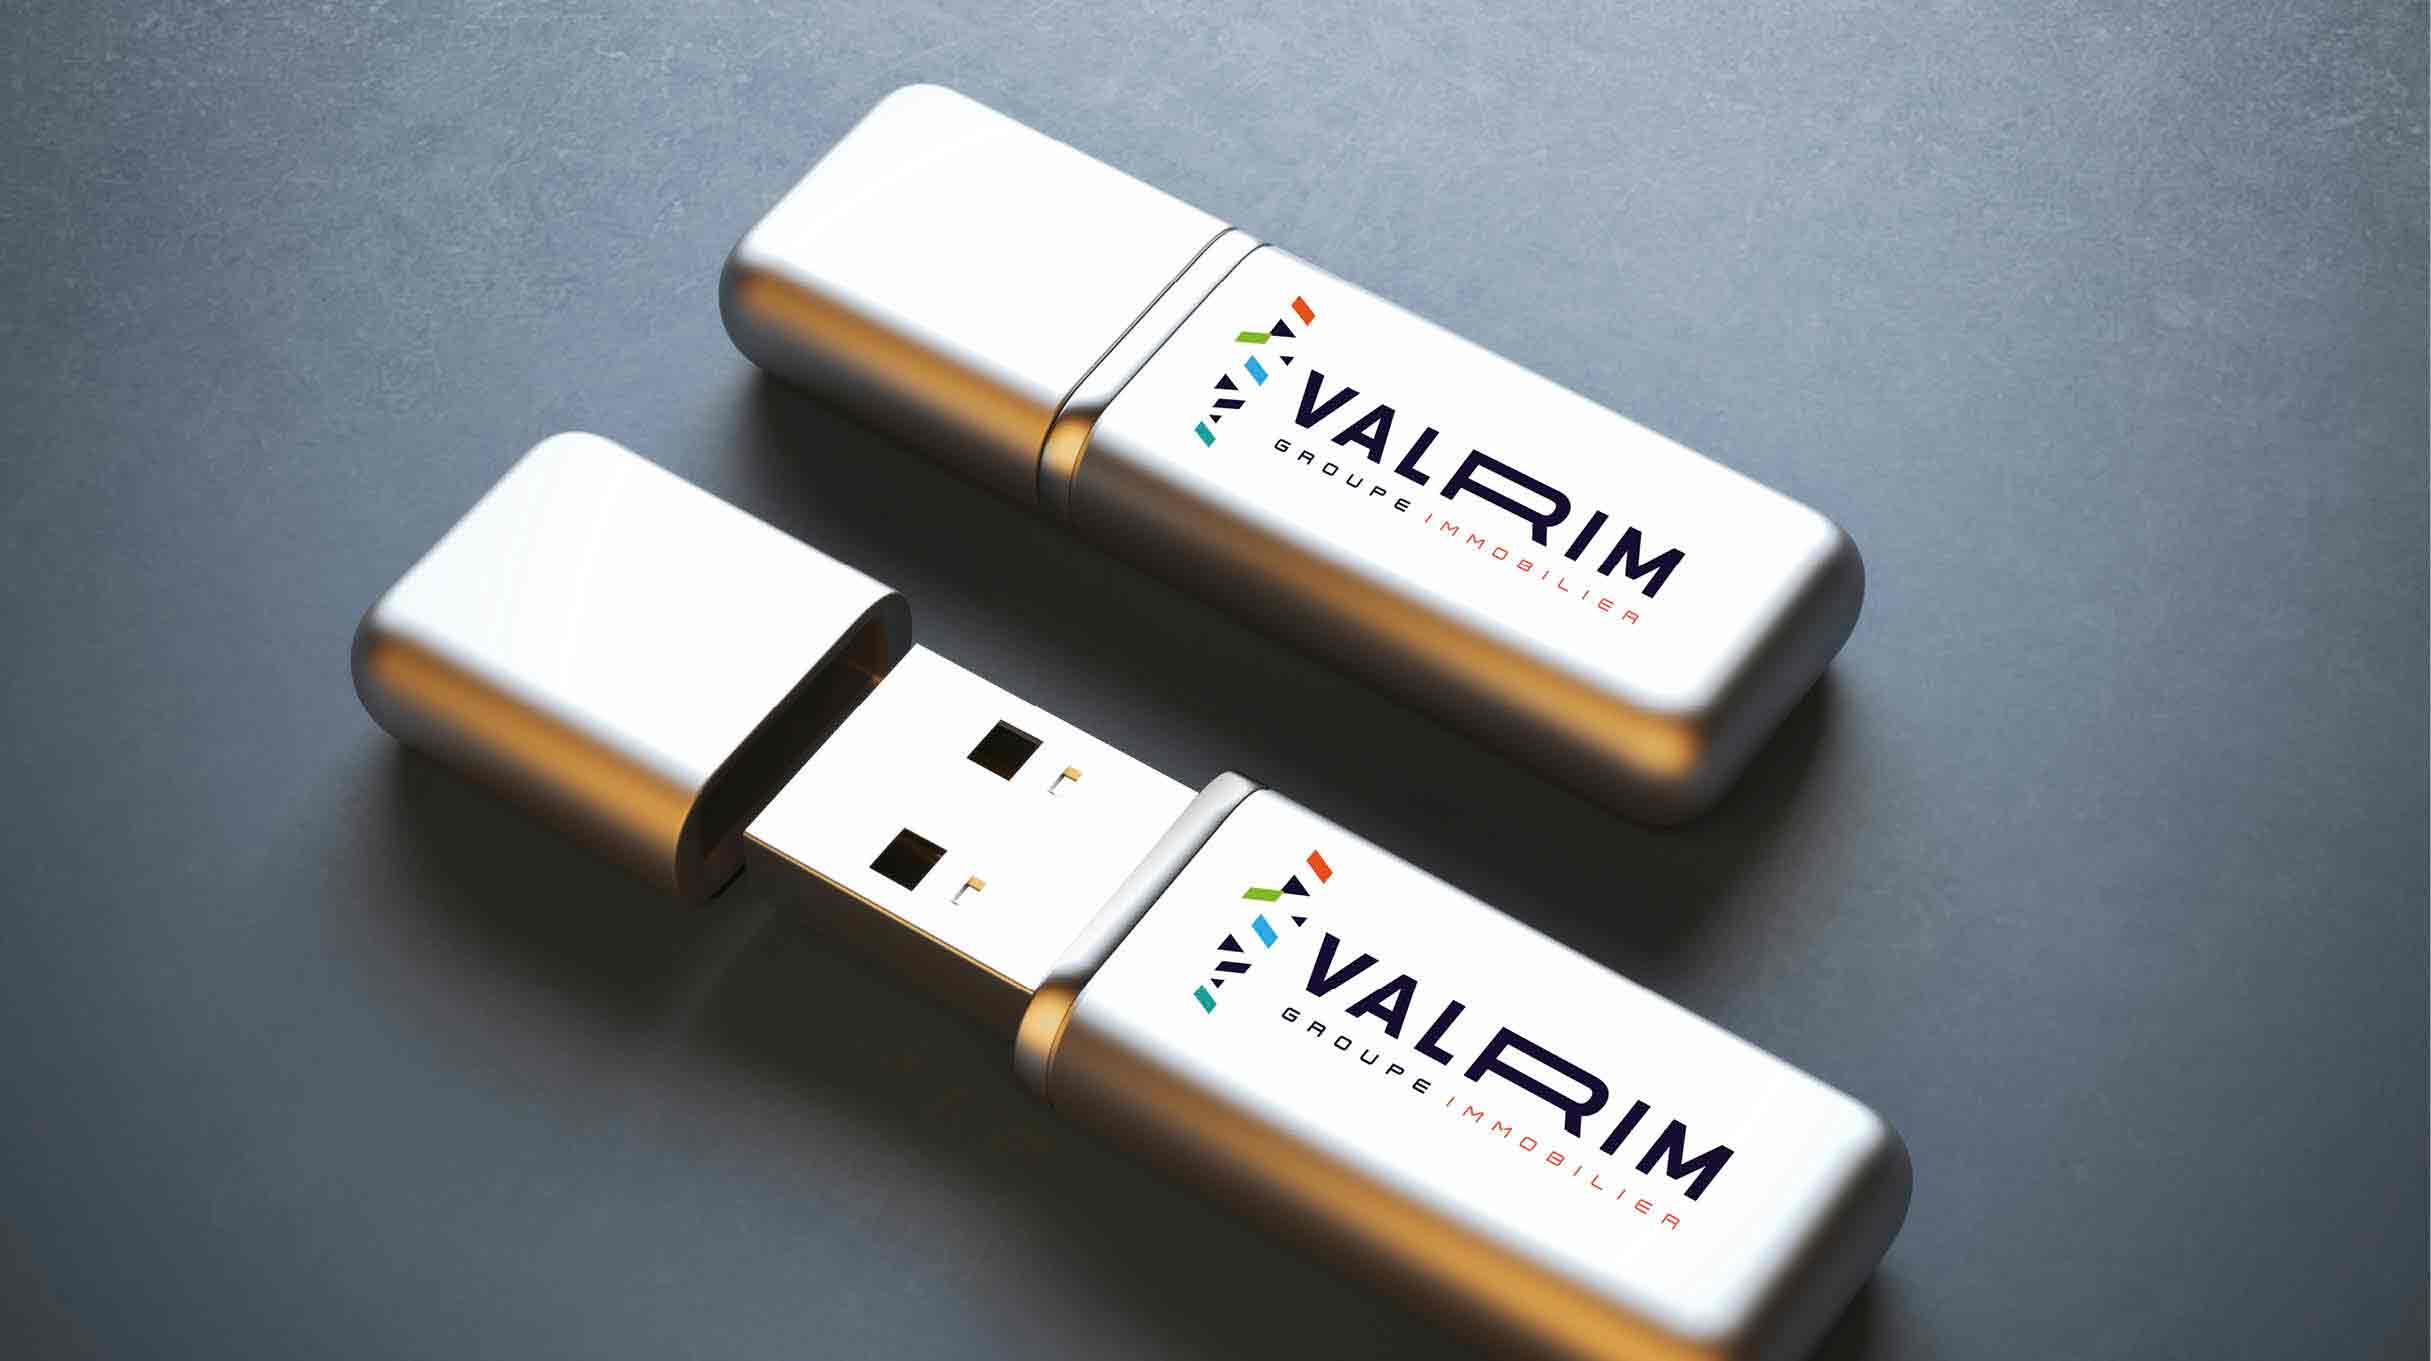 Reference6-Valrim